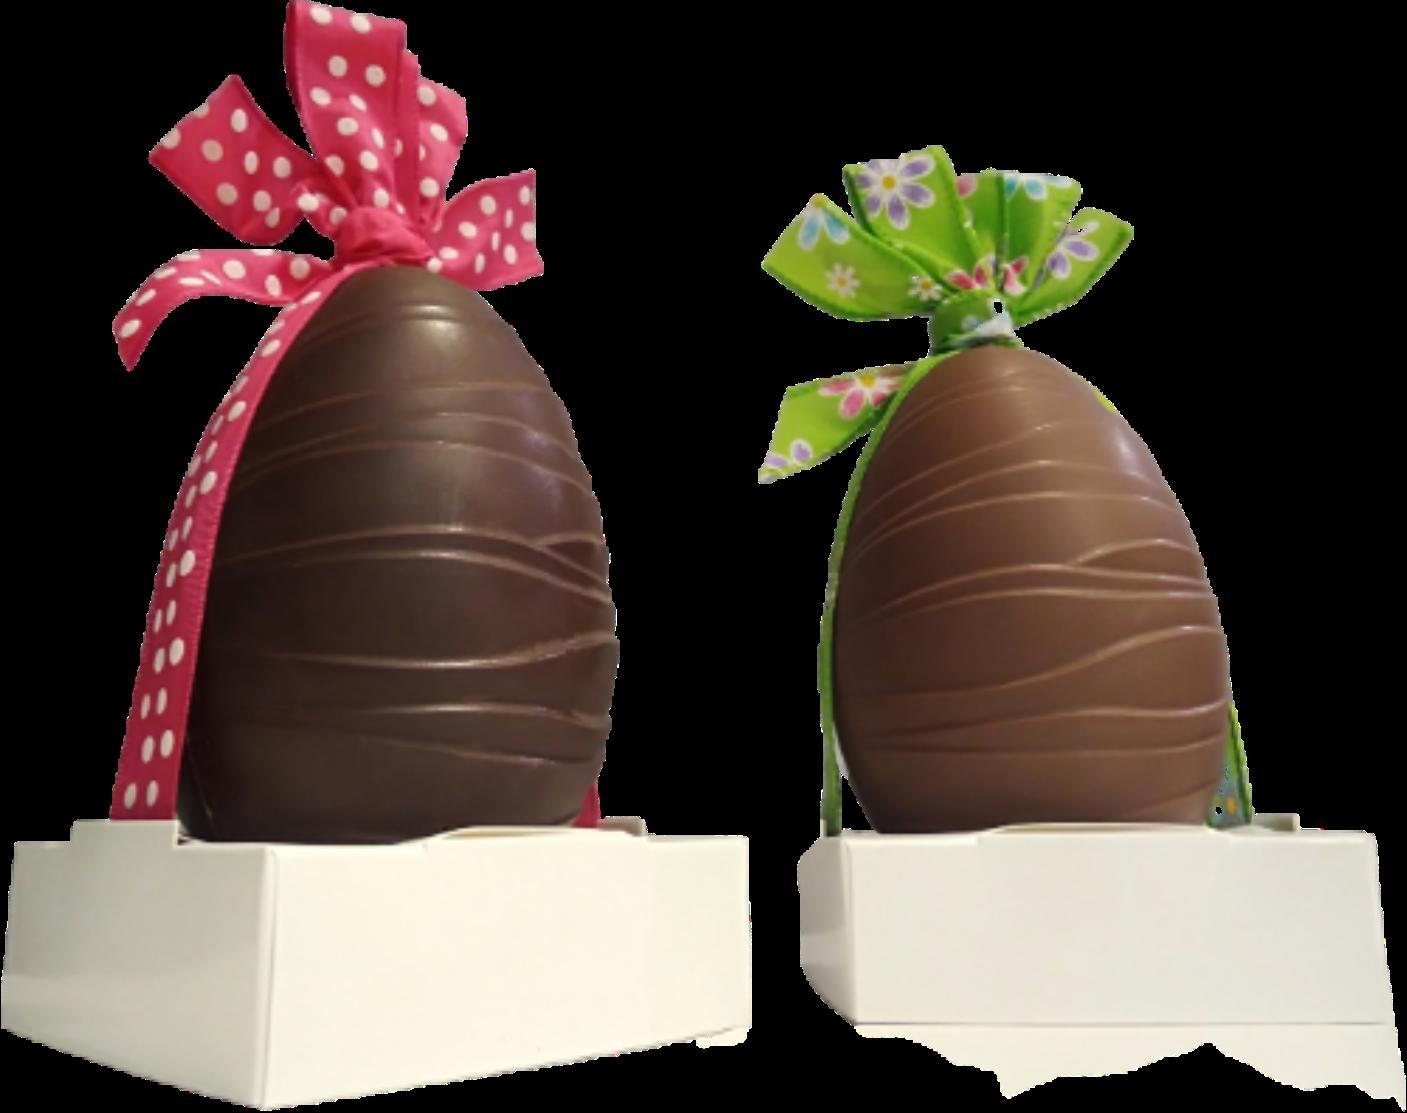 Grand oeuf chocolat Pâques 15 cm